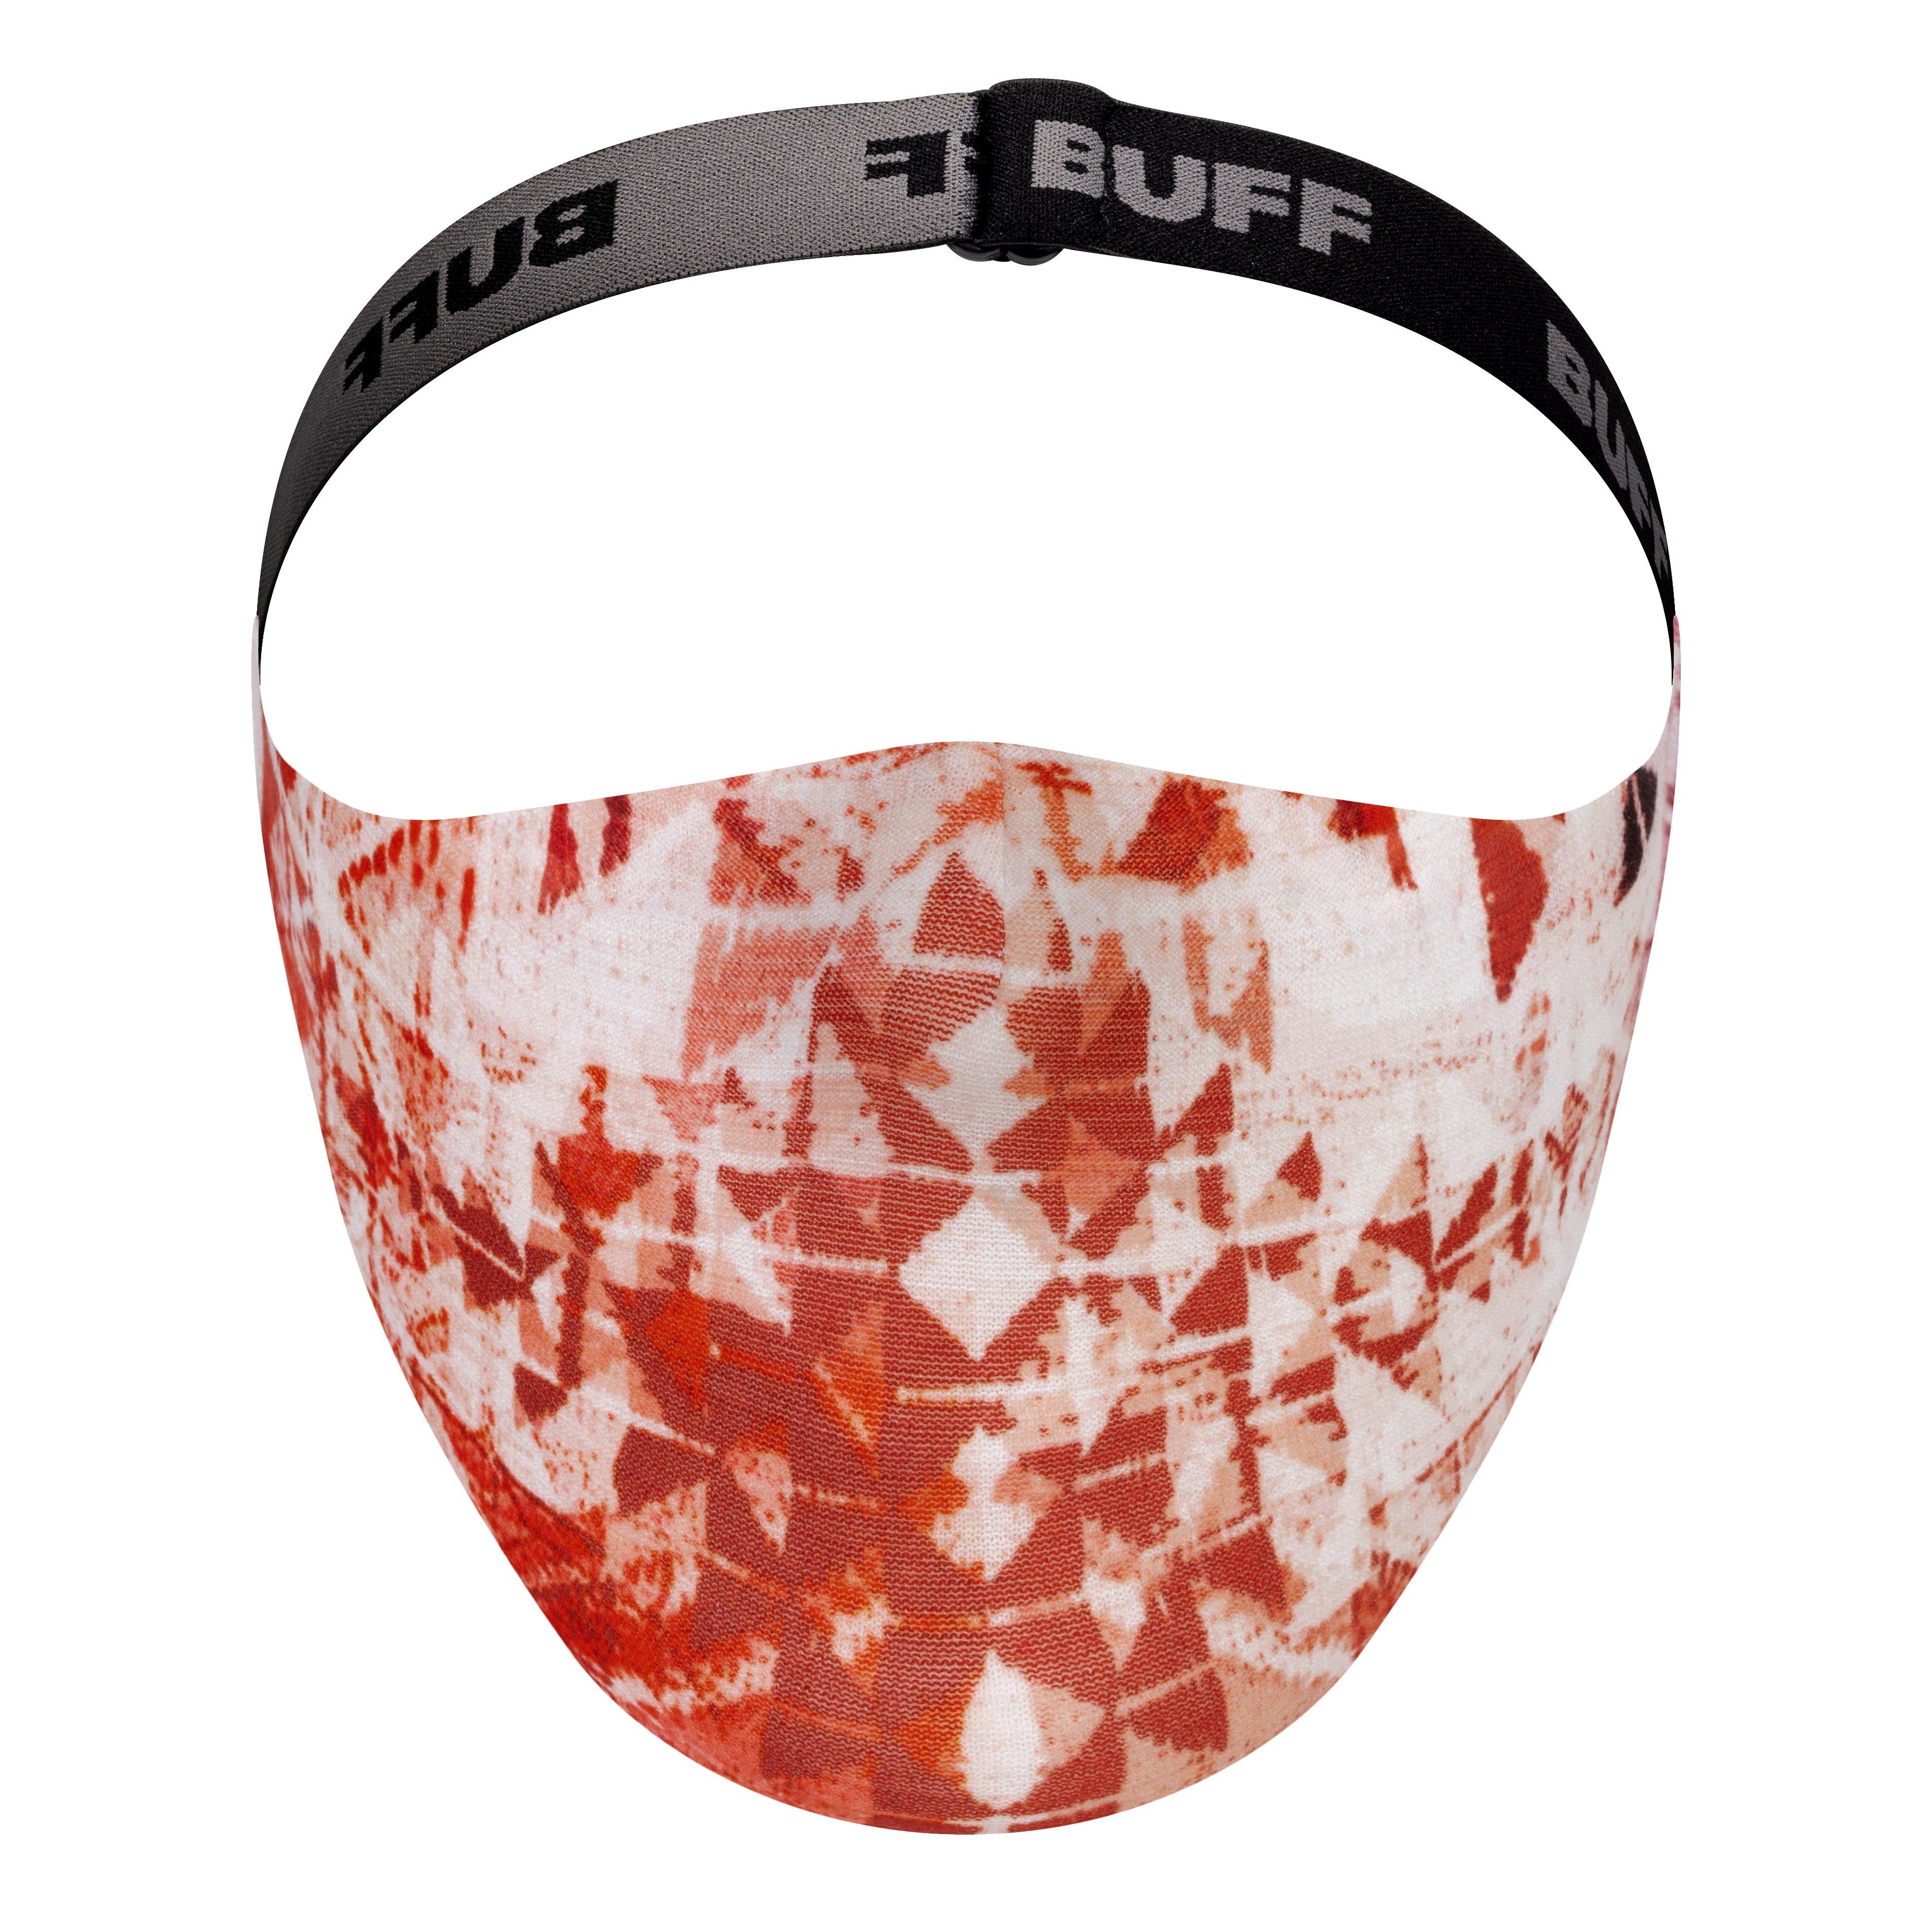 BUFF\tCoolnet抗UV可替換濾網口罩 萬象菱格\tBF126639-555\tZ1350\t【Happy Outdoor 花蓮遊遍天下】